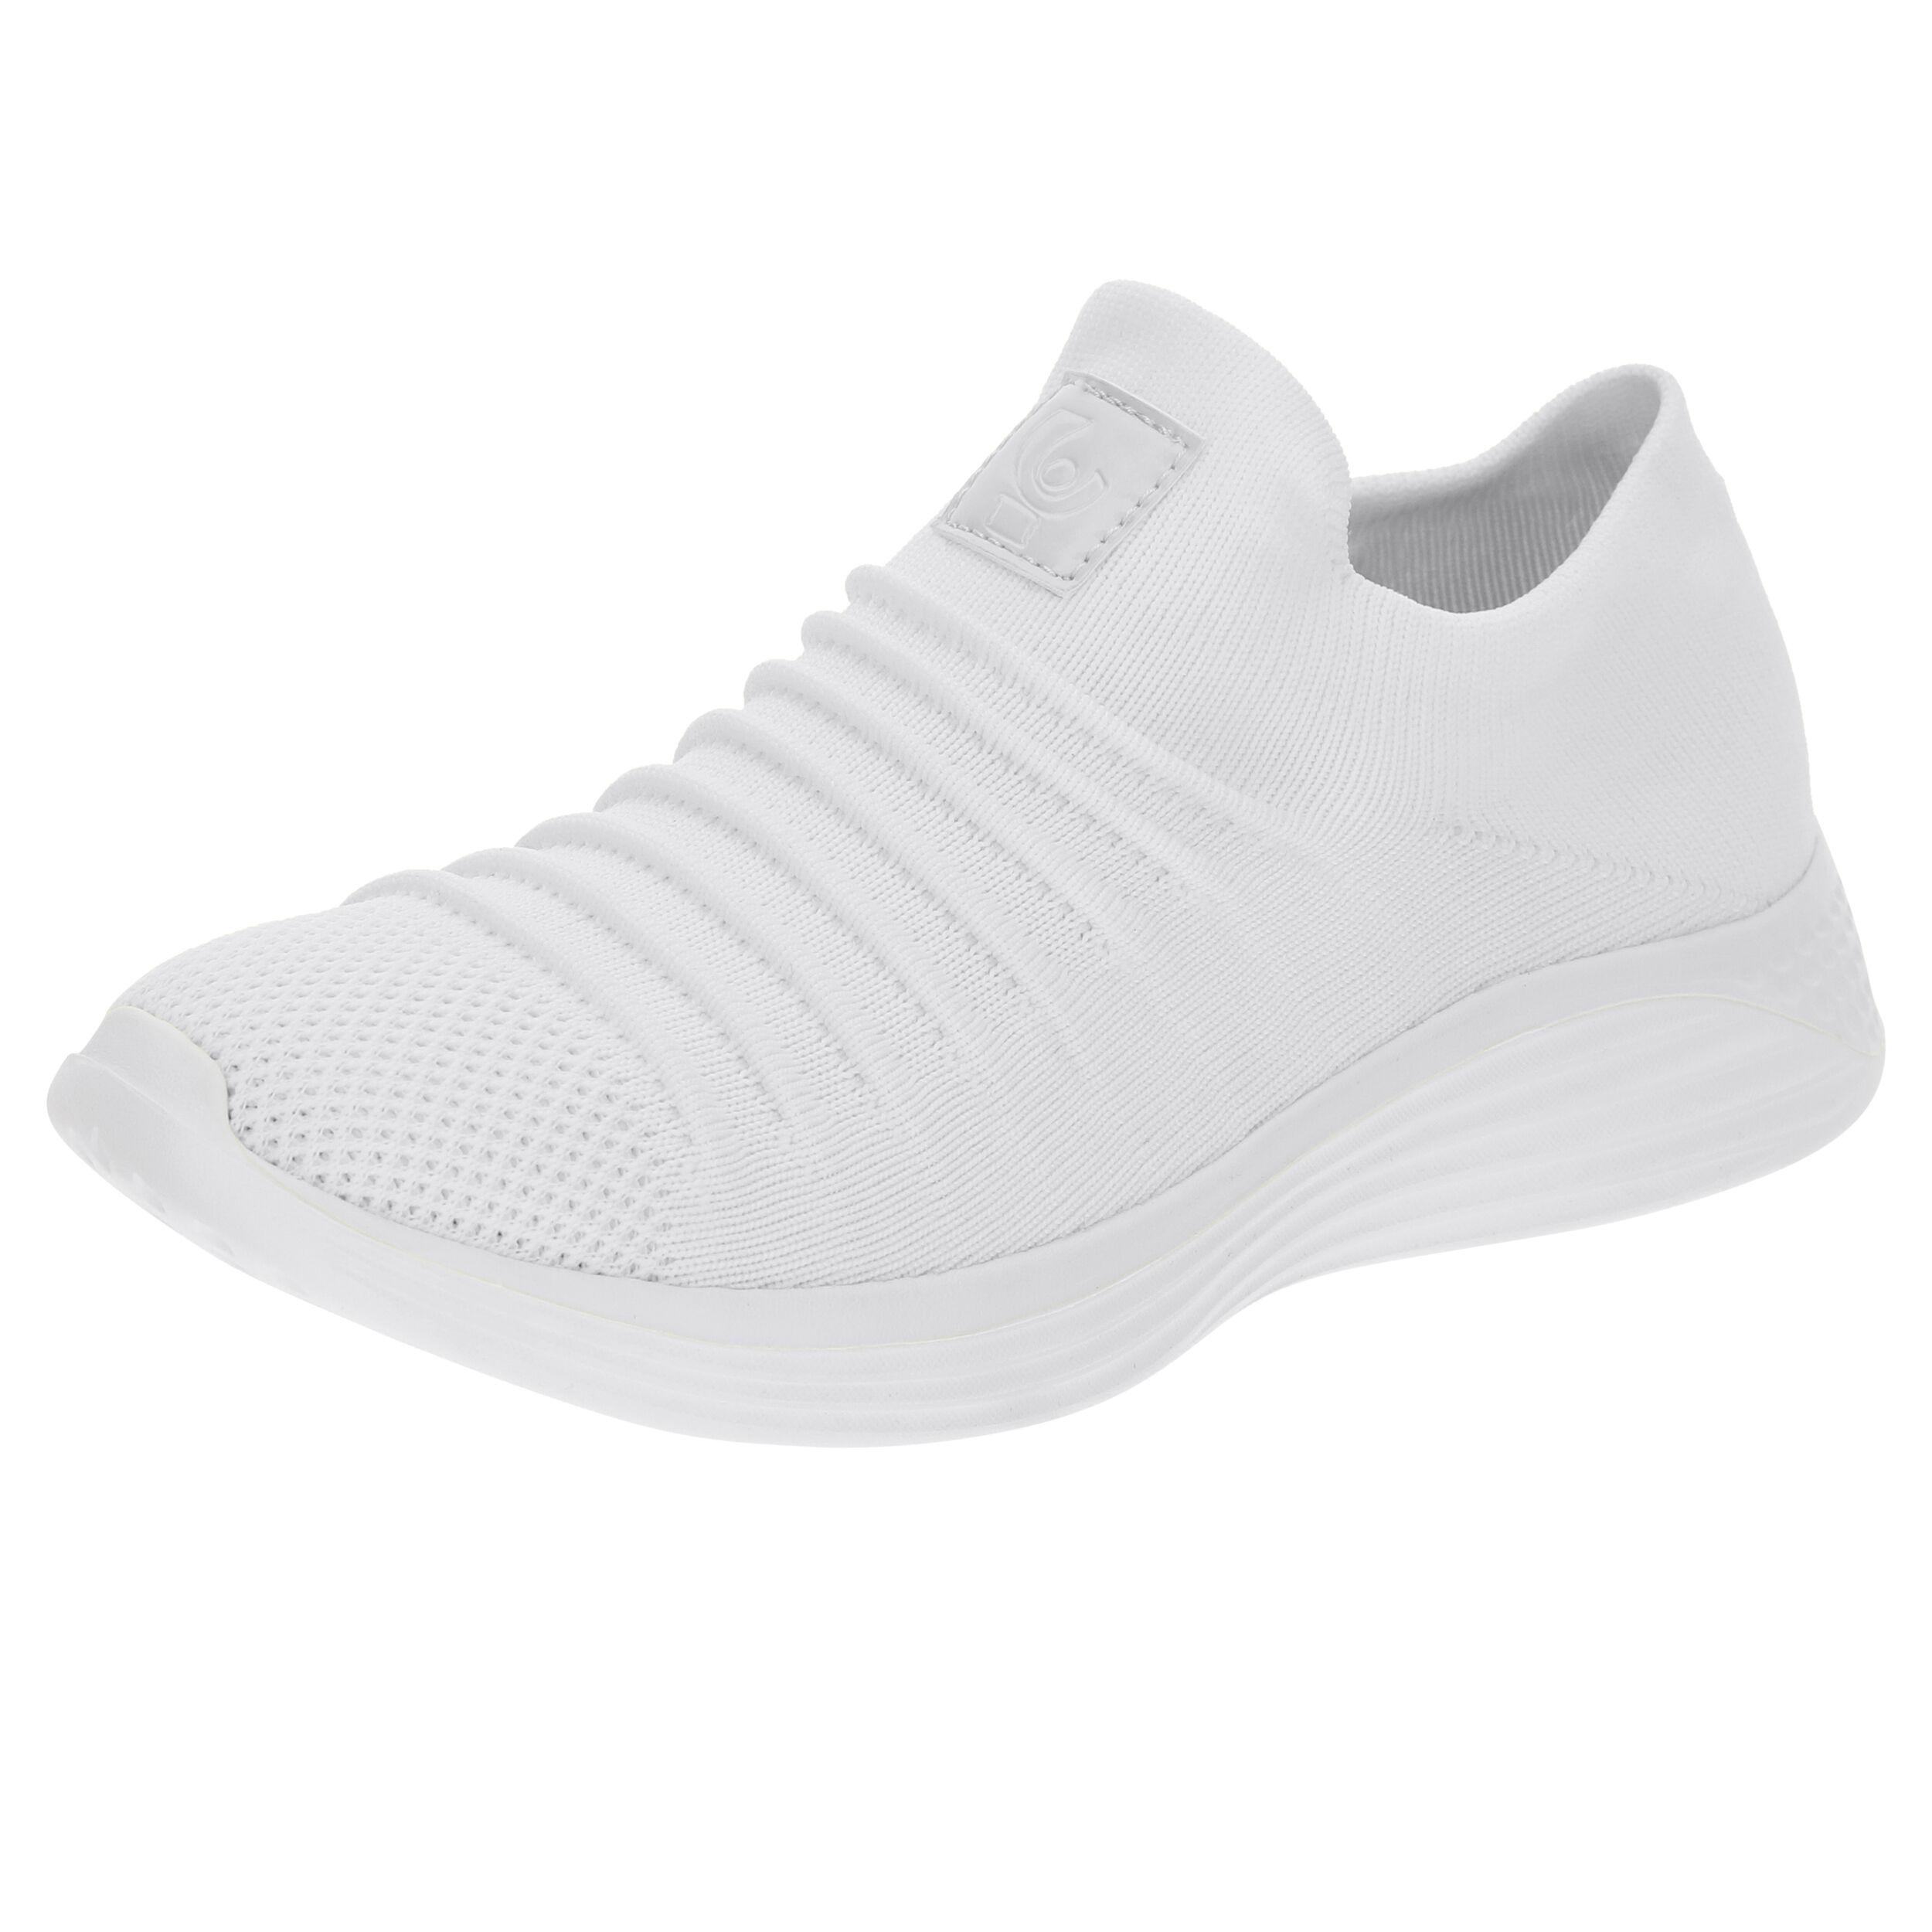 Freddy Sneakers slip-on con tomaia seamless e suola EVA Bianco